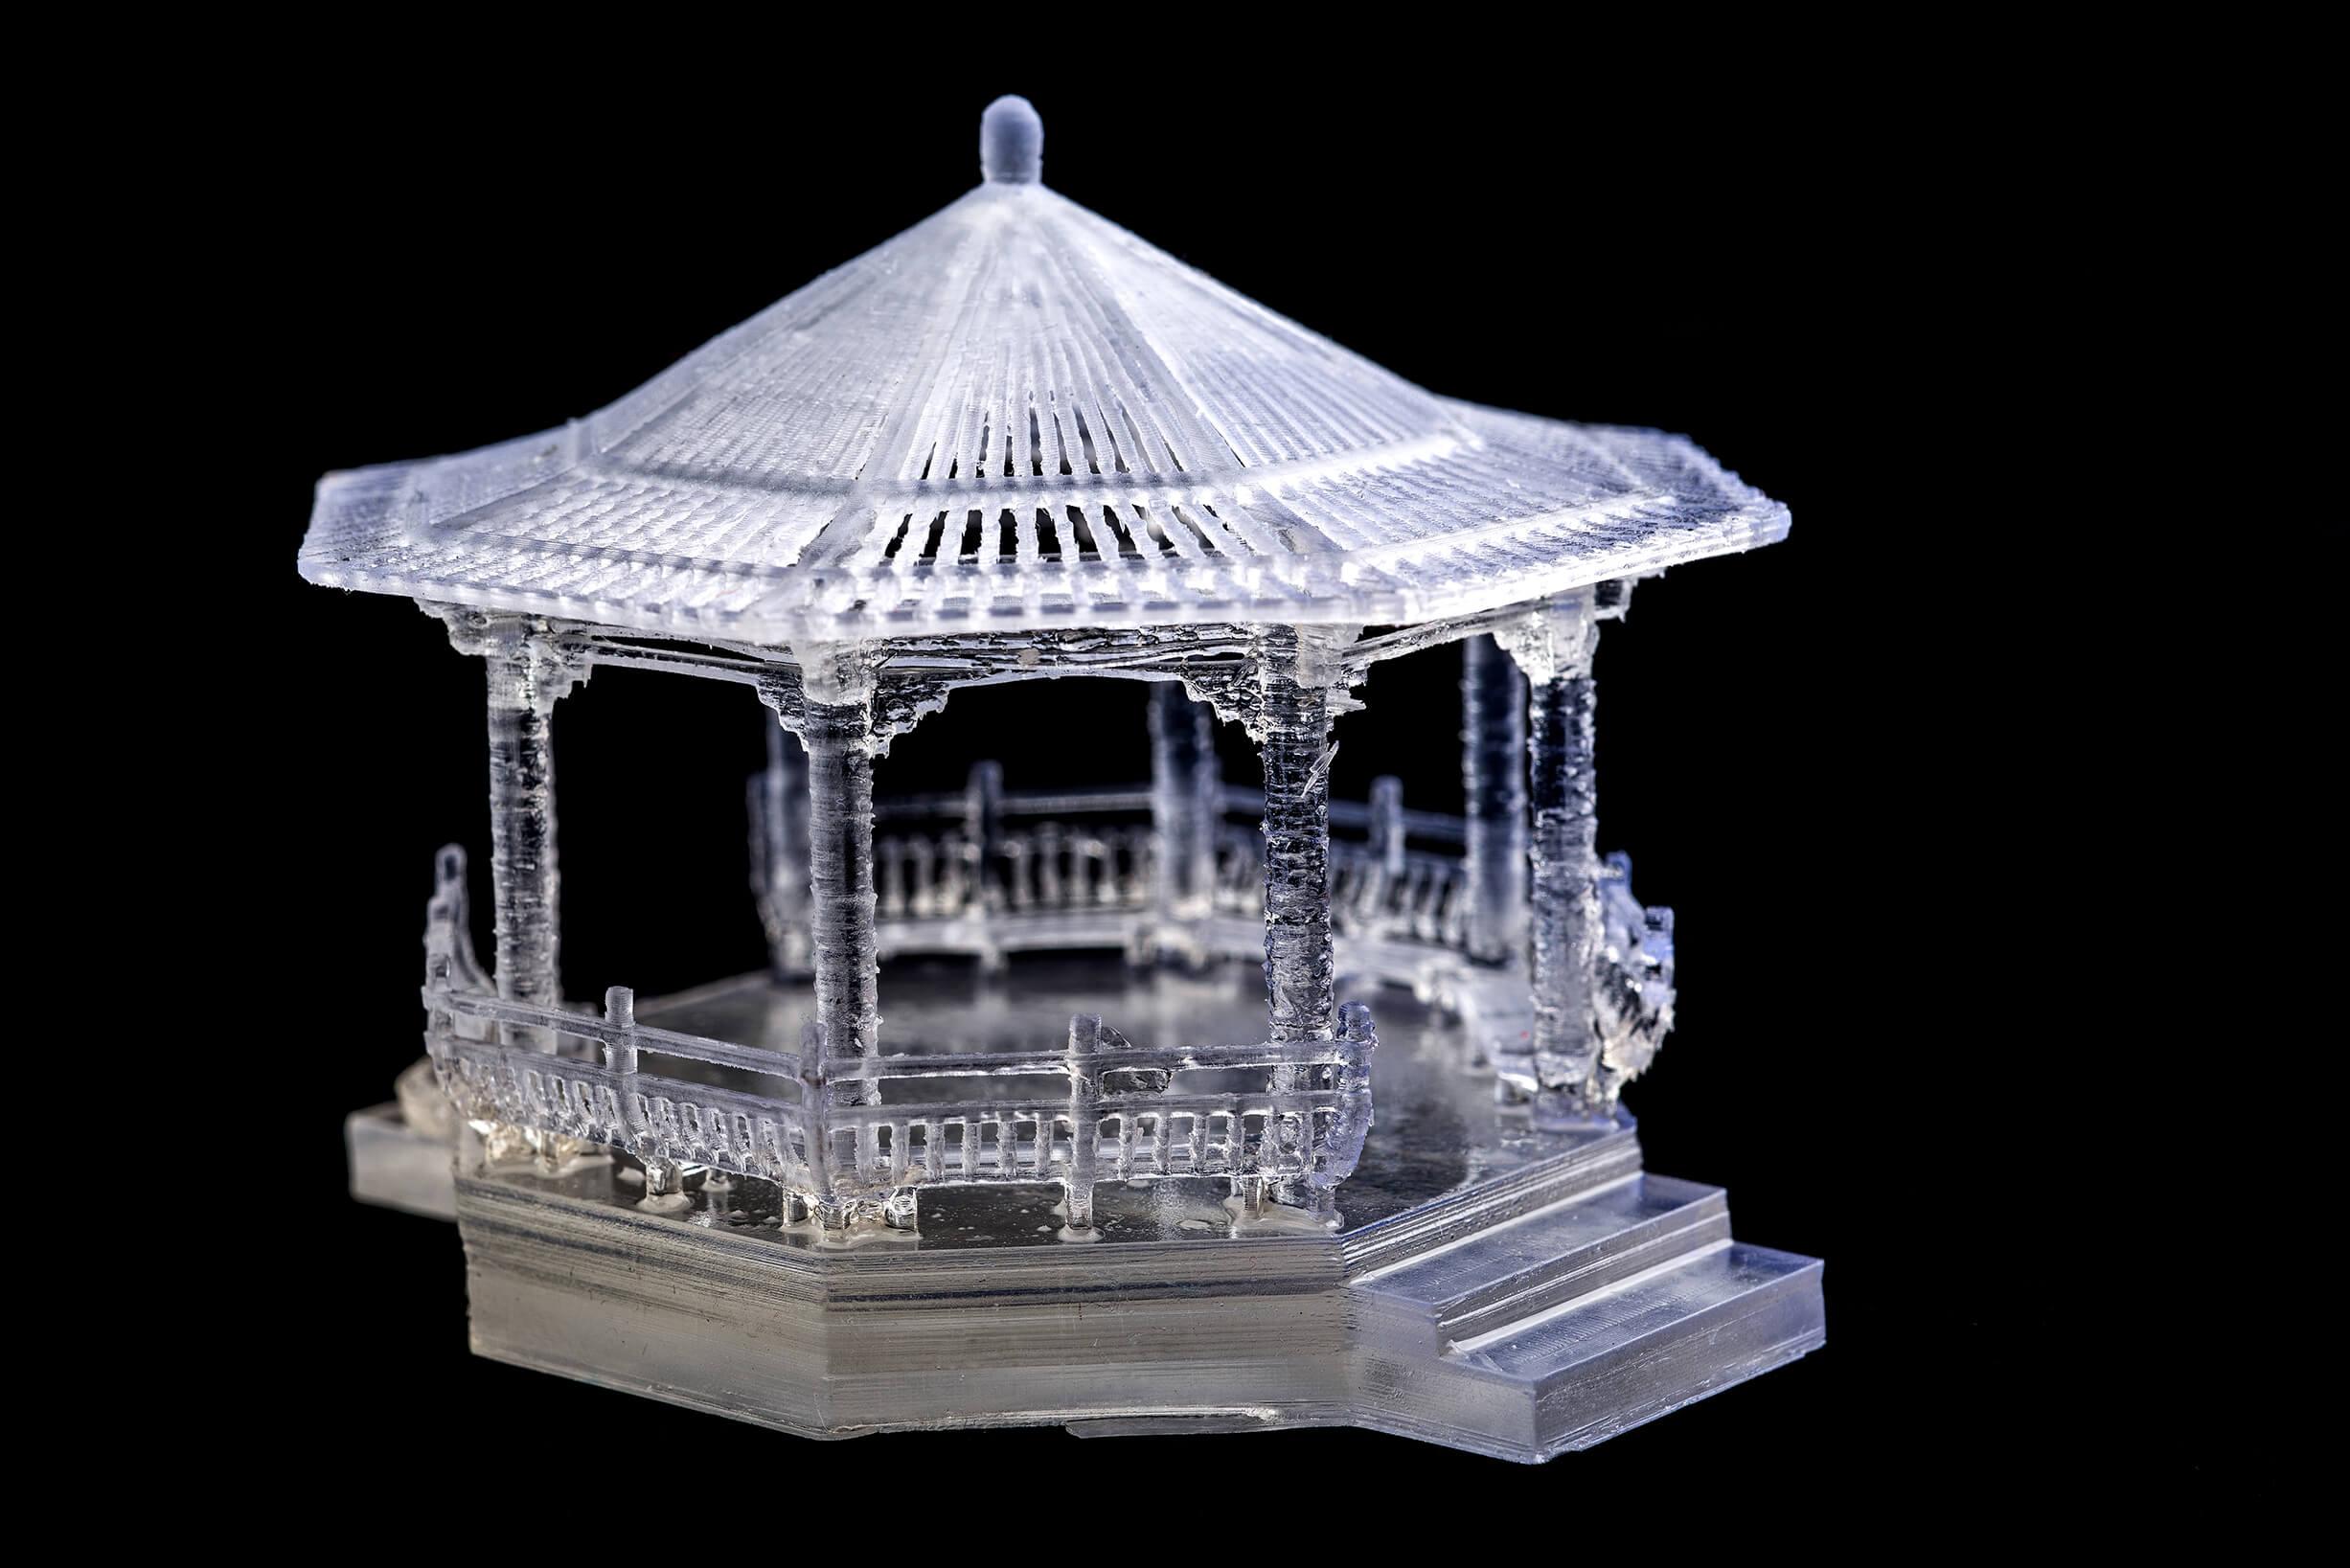 Prints2FunPlay Series3D Dream WorkshopSLA 3D PrinterDIY